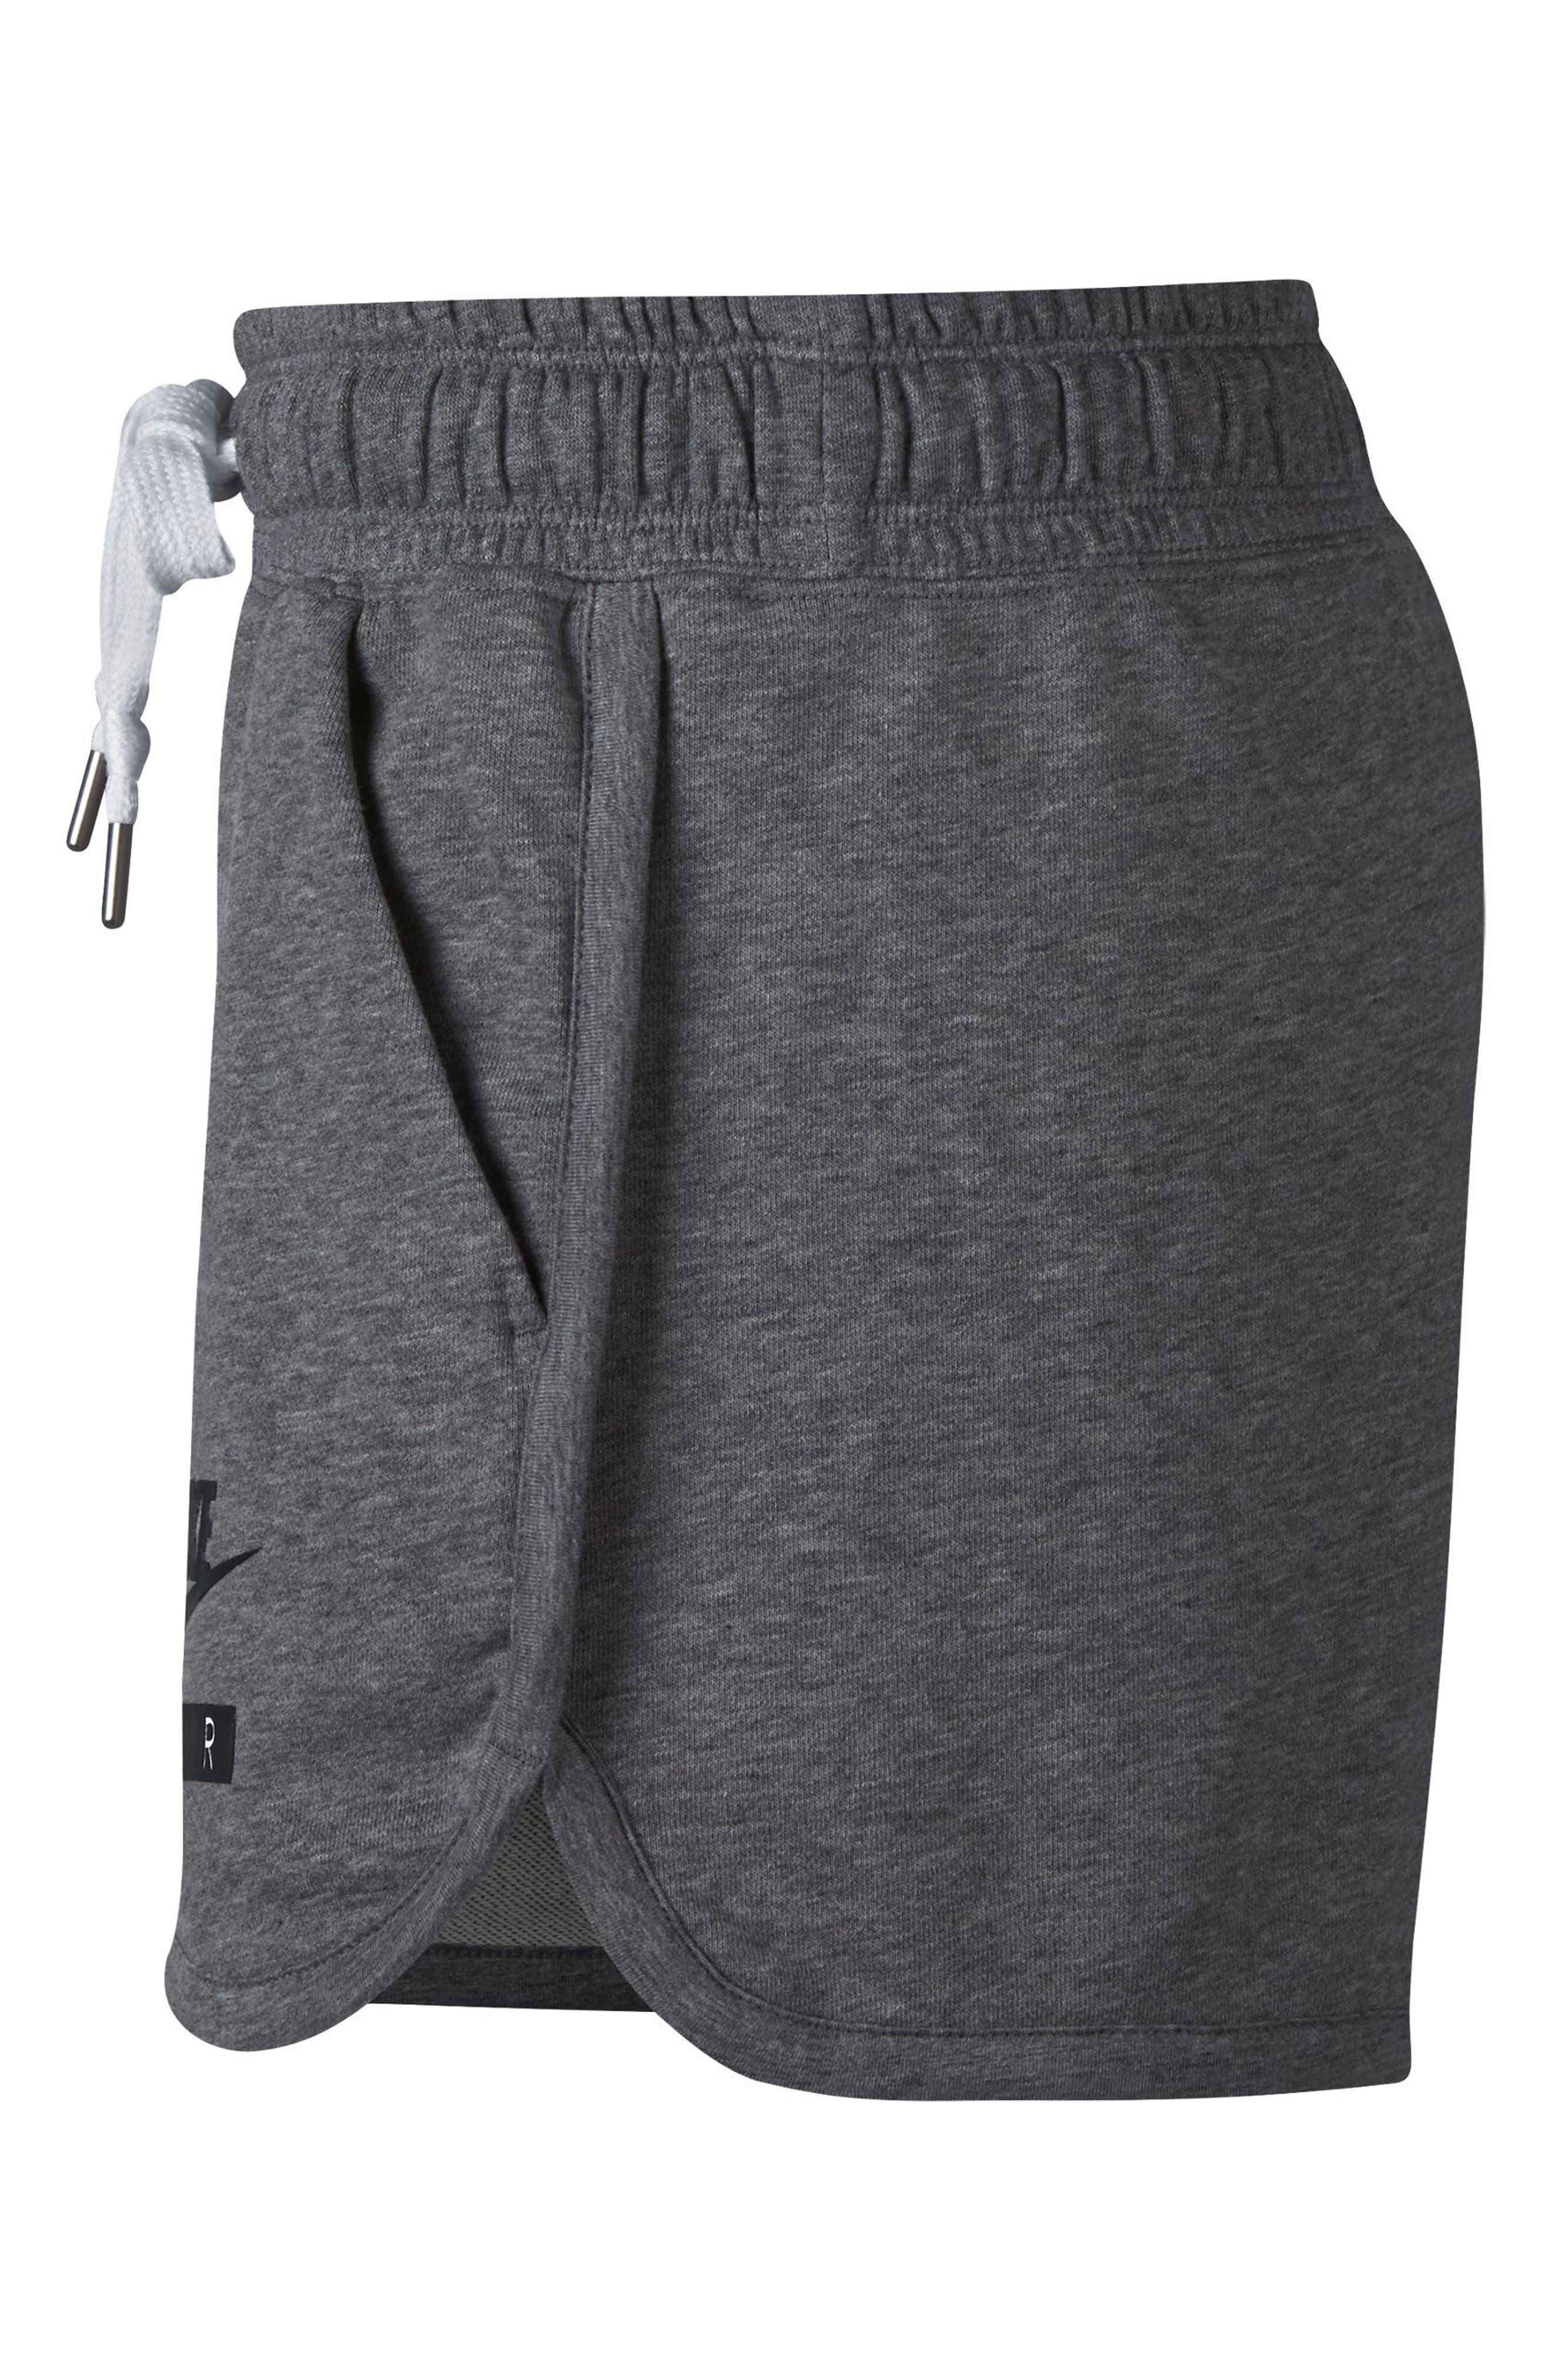 Sportswear Air Gym Shorts,                             Alternate thumbnail 9, color,